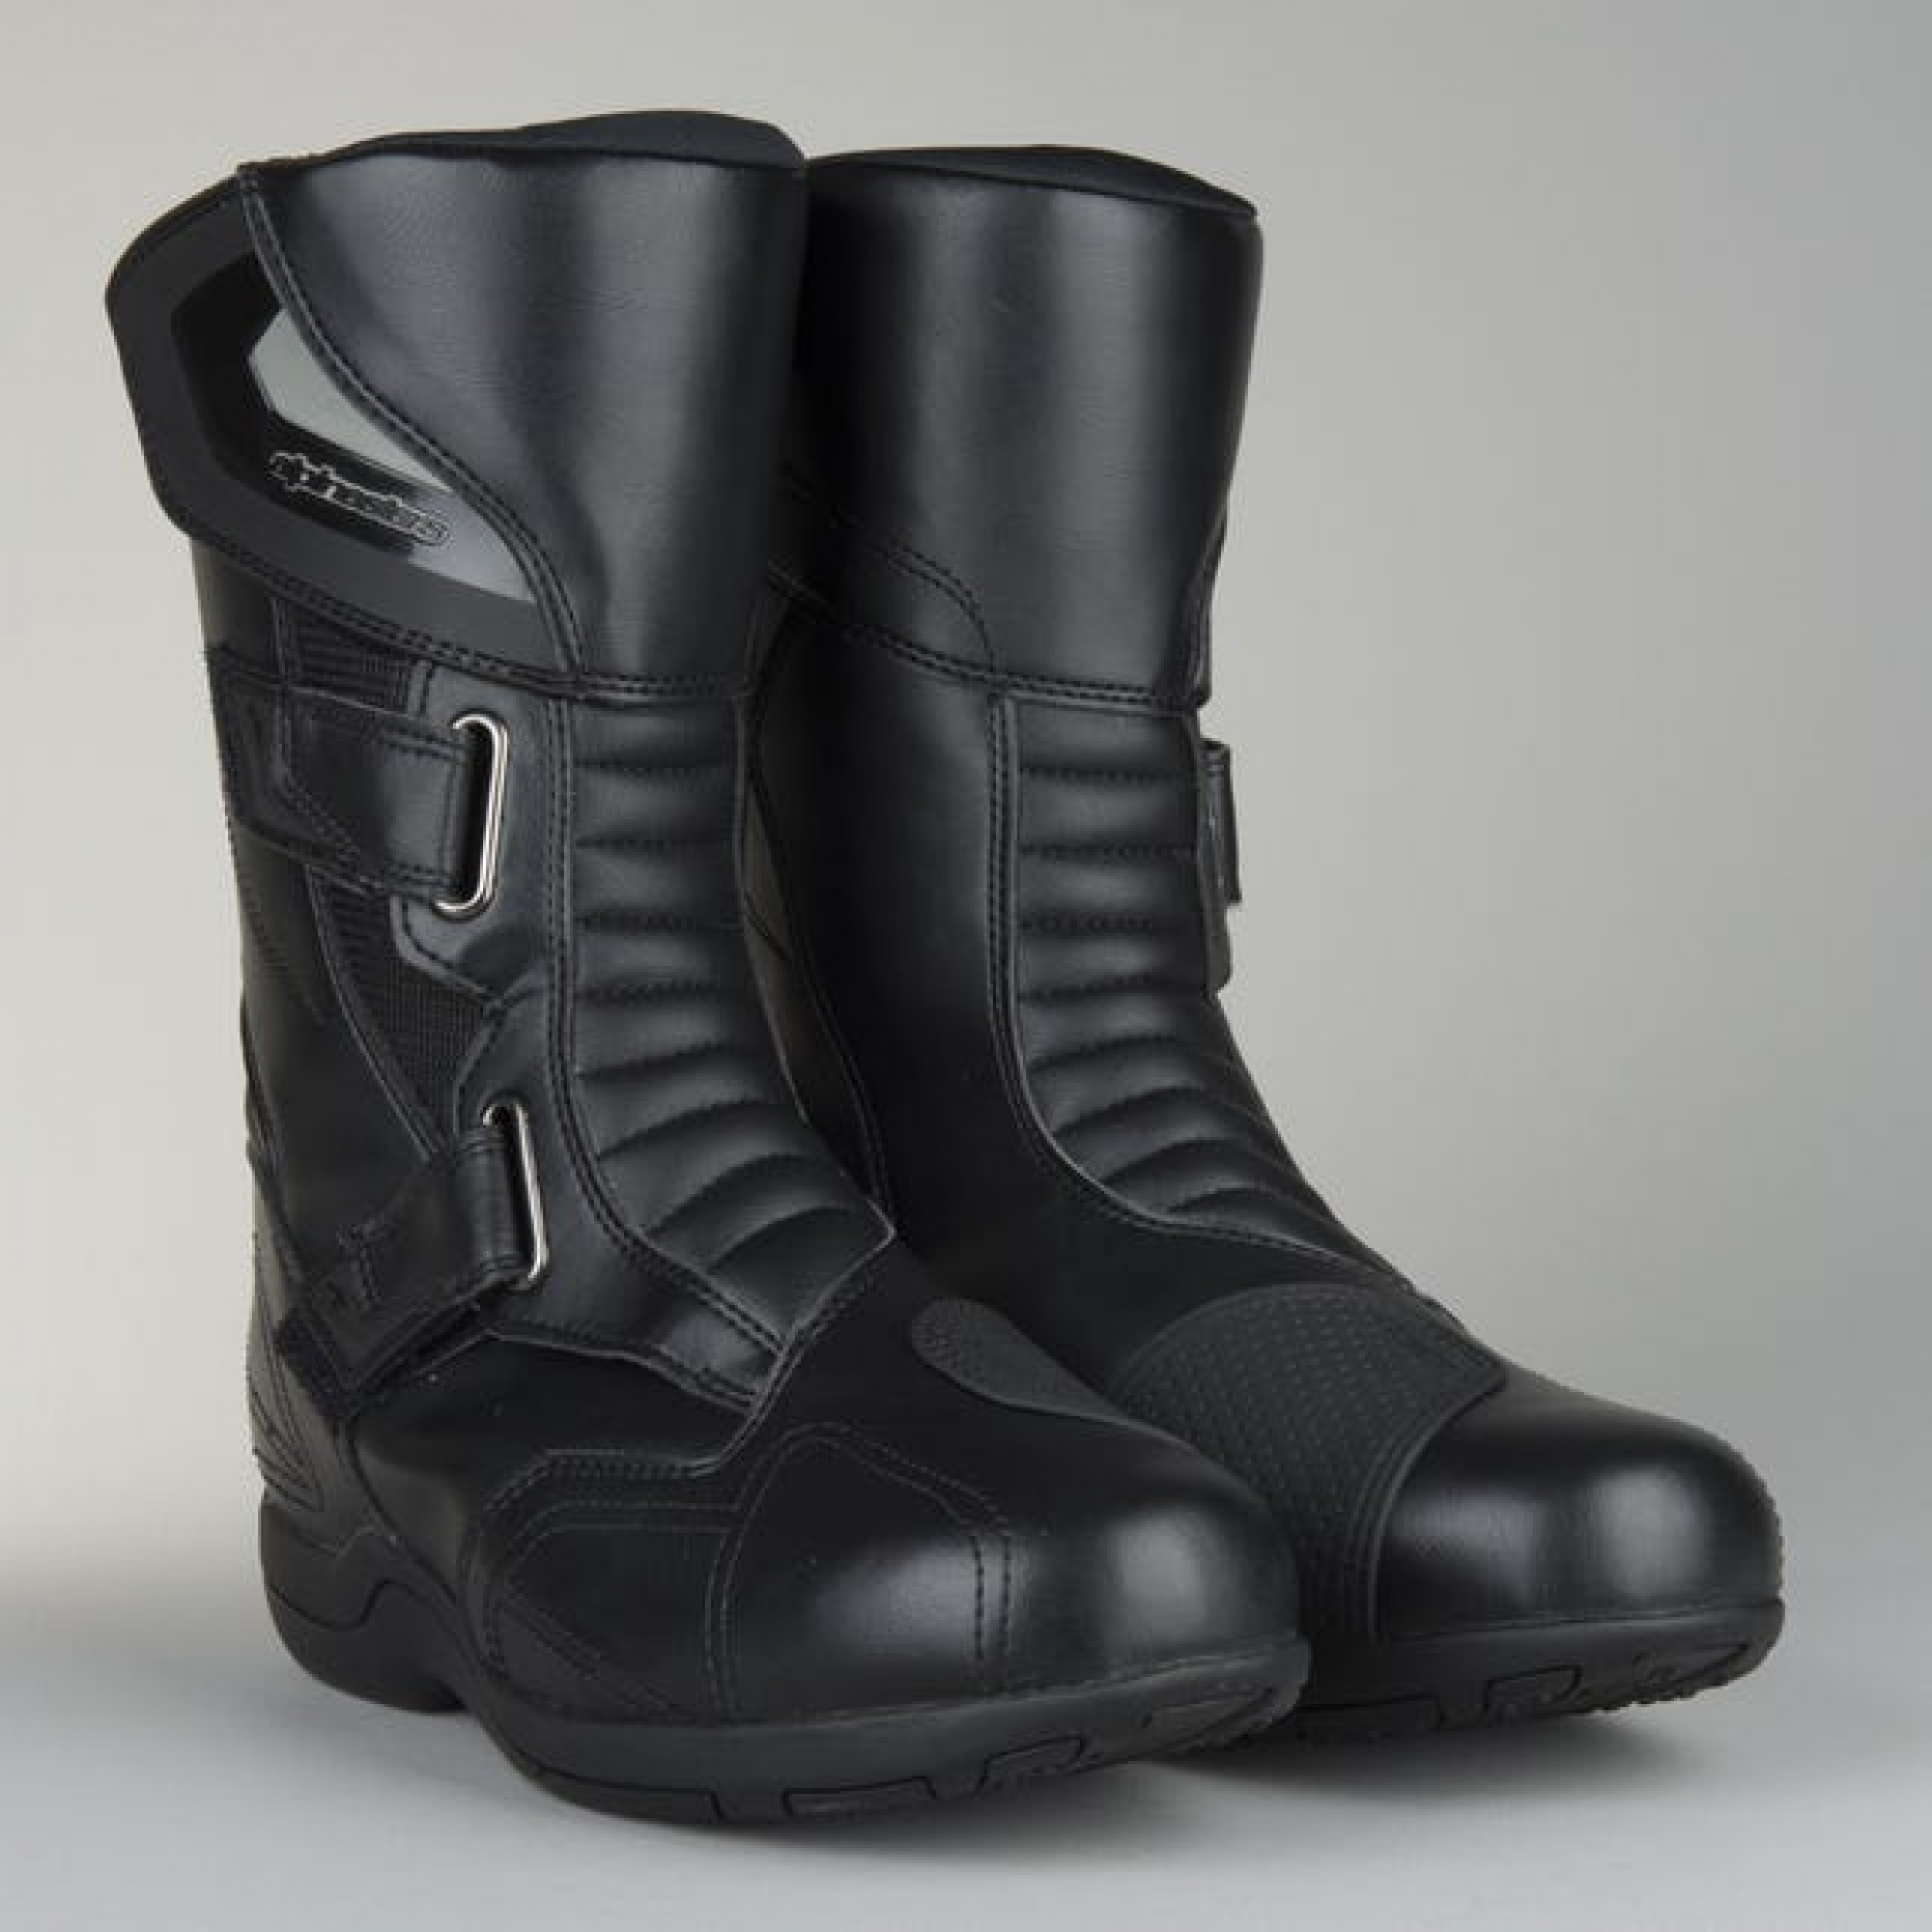 Alpinestars Roam 2 Boots Waterproof